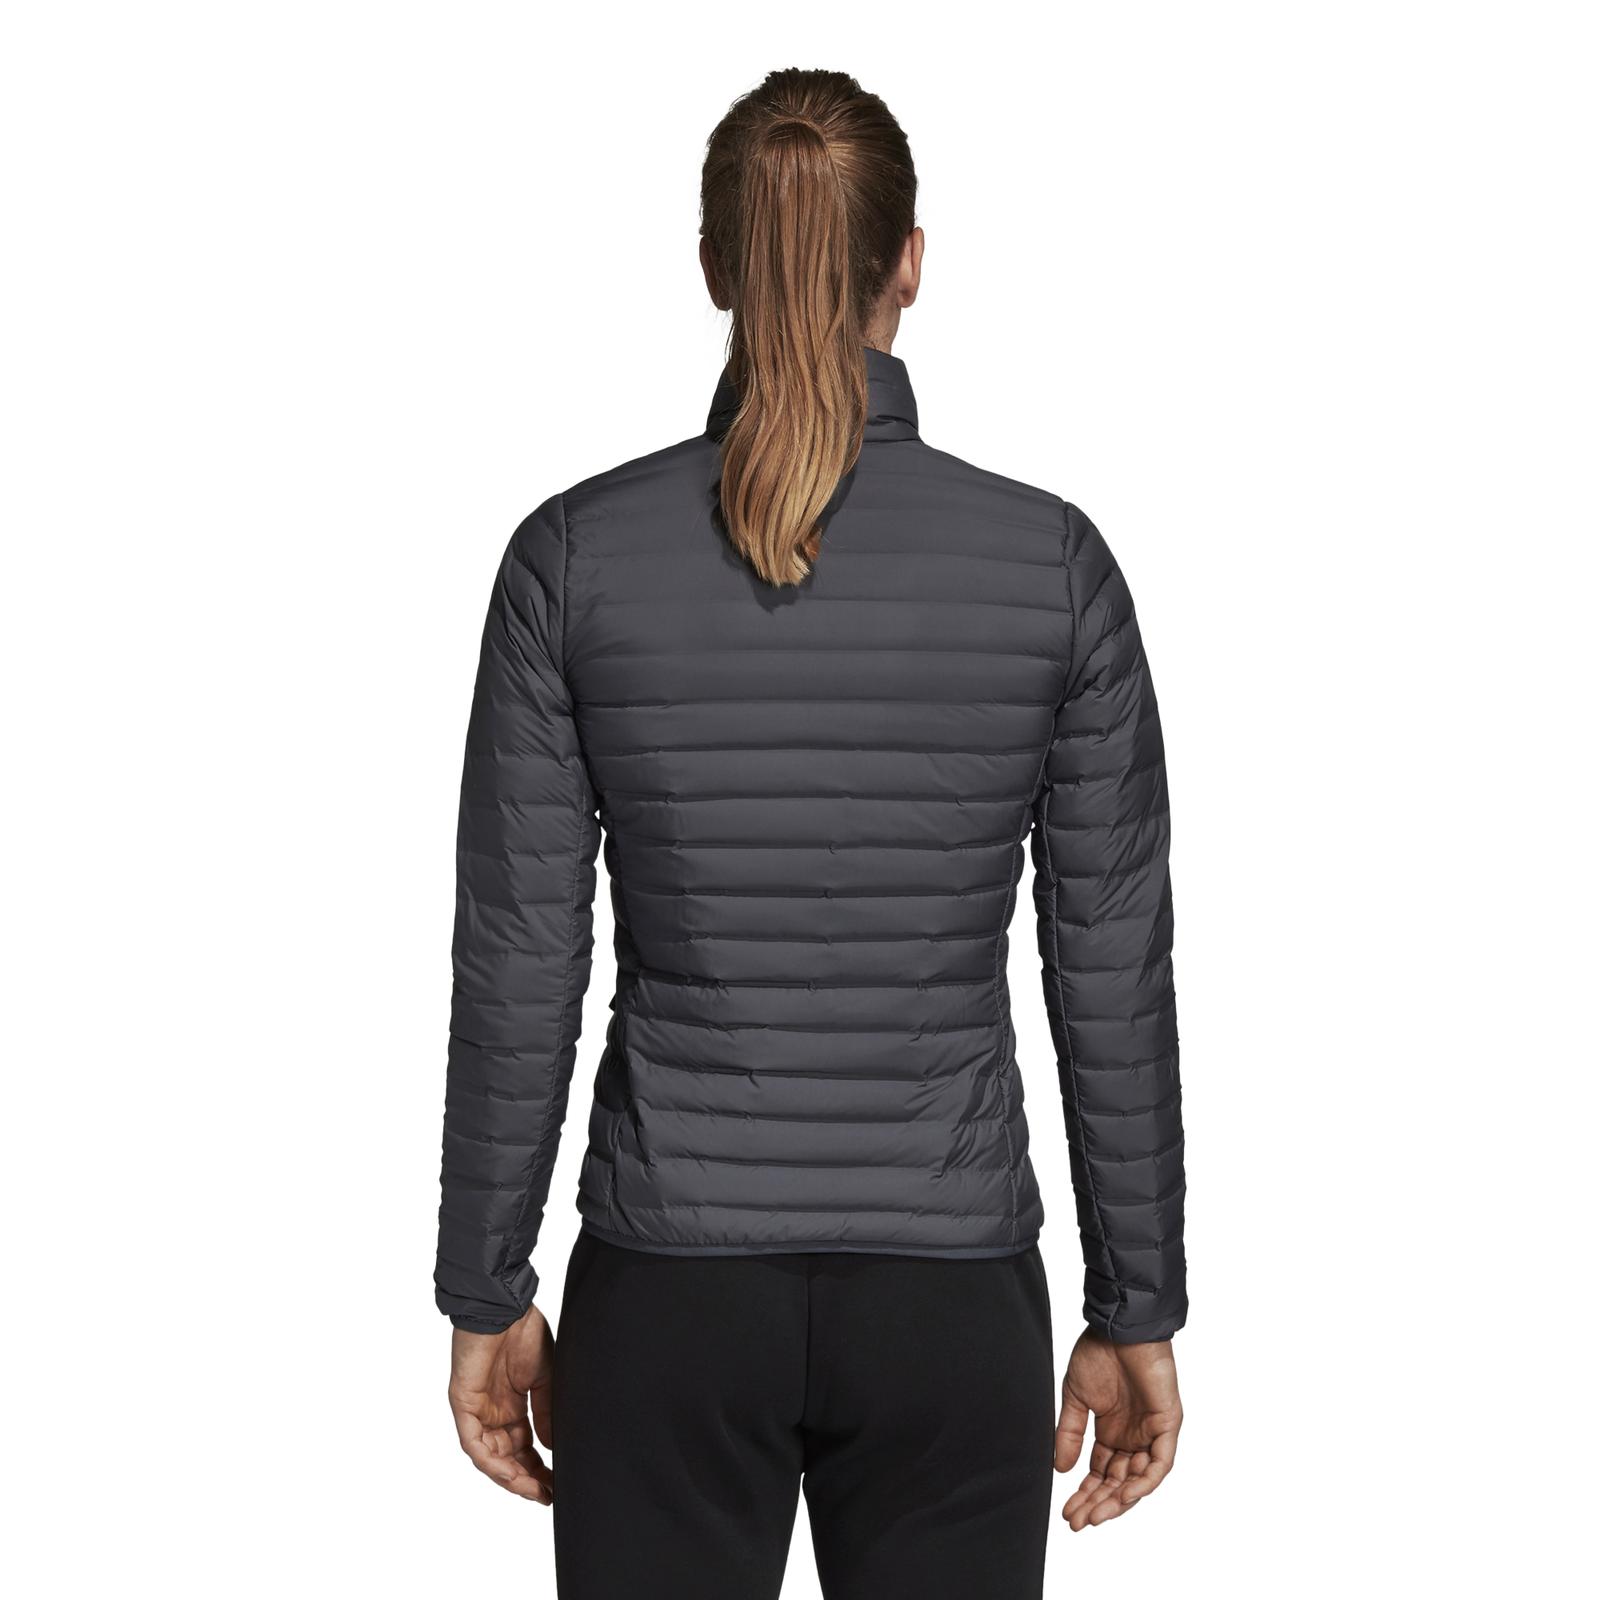 Down Adidas Performance Carbon Women's Casual Jacket Details About Varilite wOPn0k8